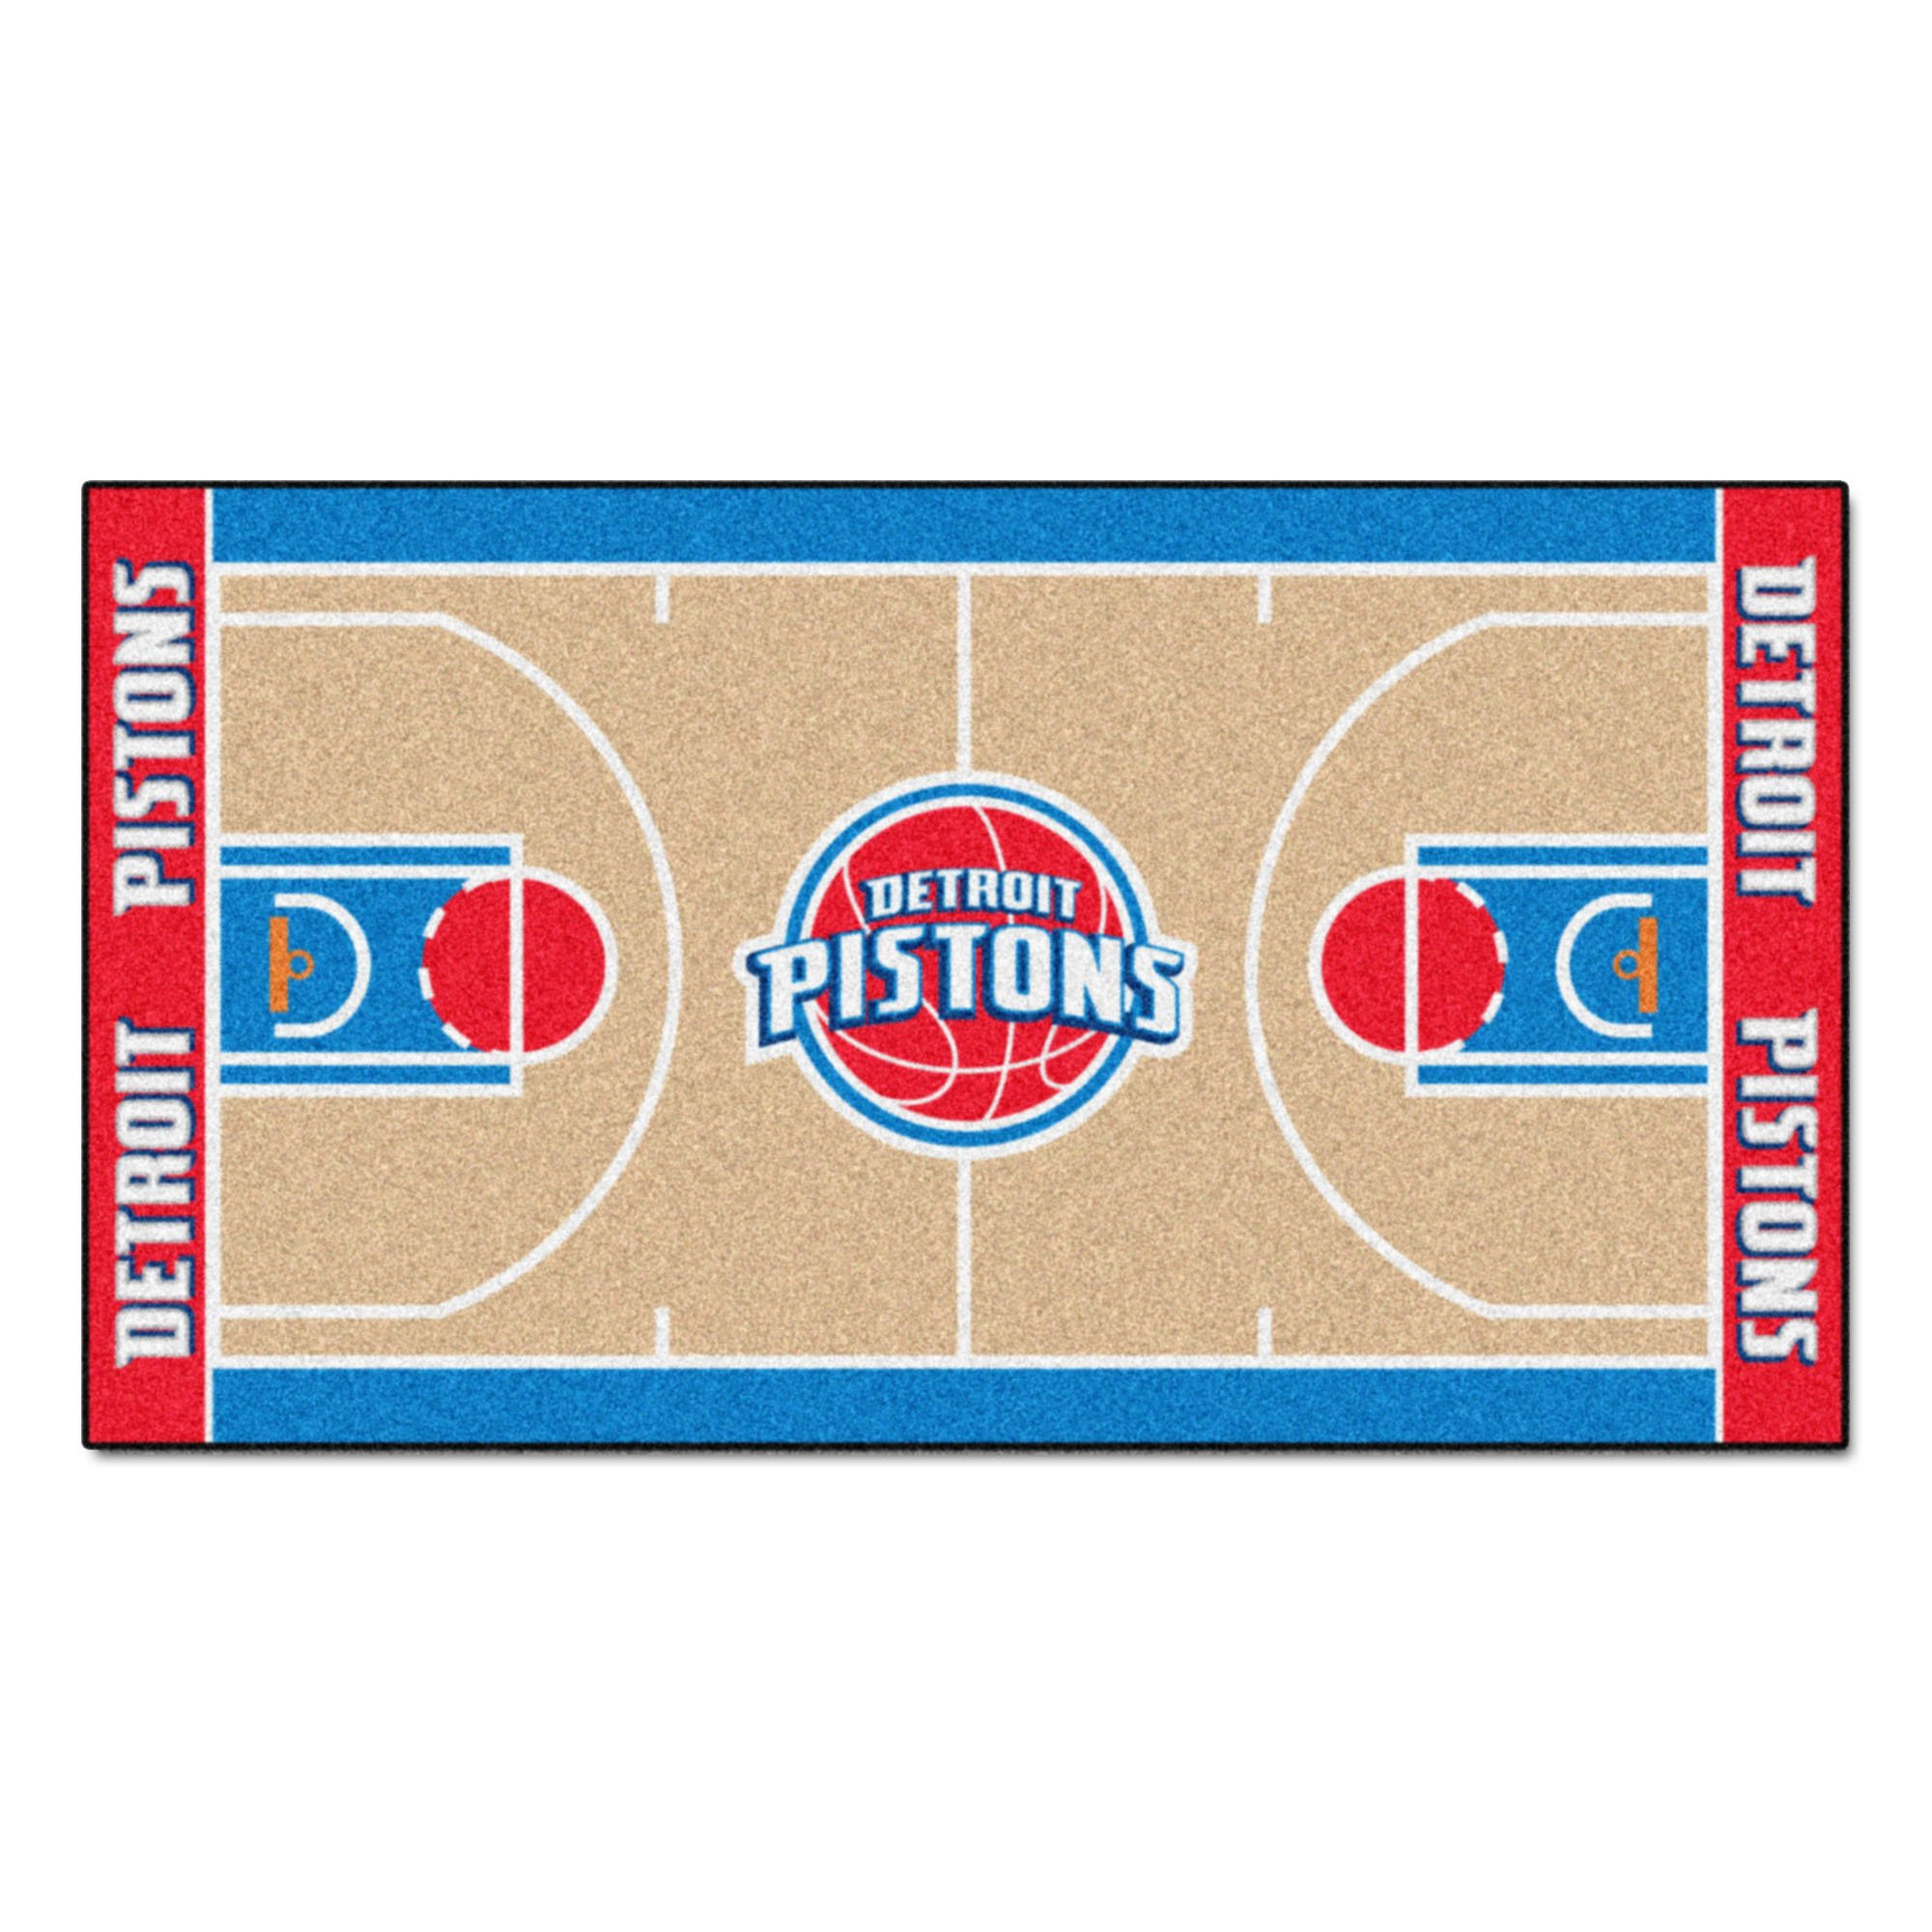 FANMATS NBA Detroit Pistons Nylon Face NBA Court Runner-Small